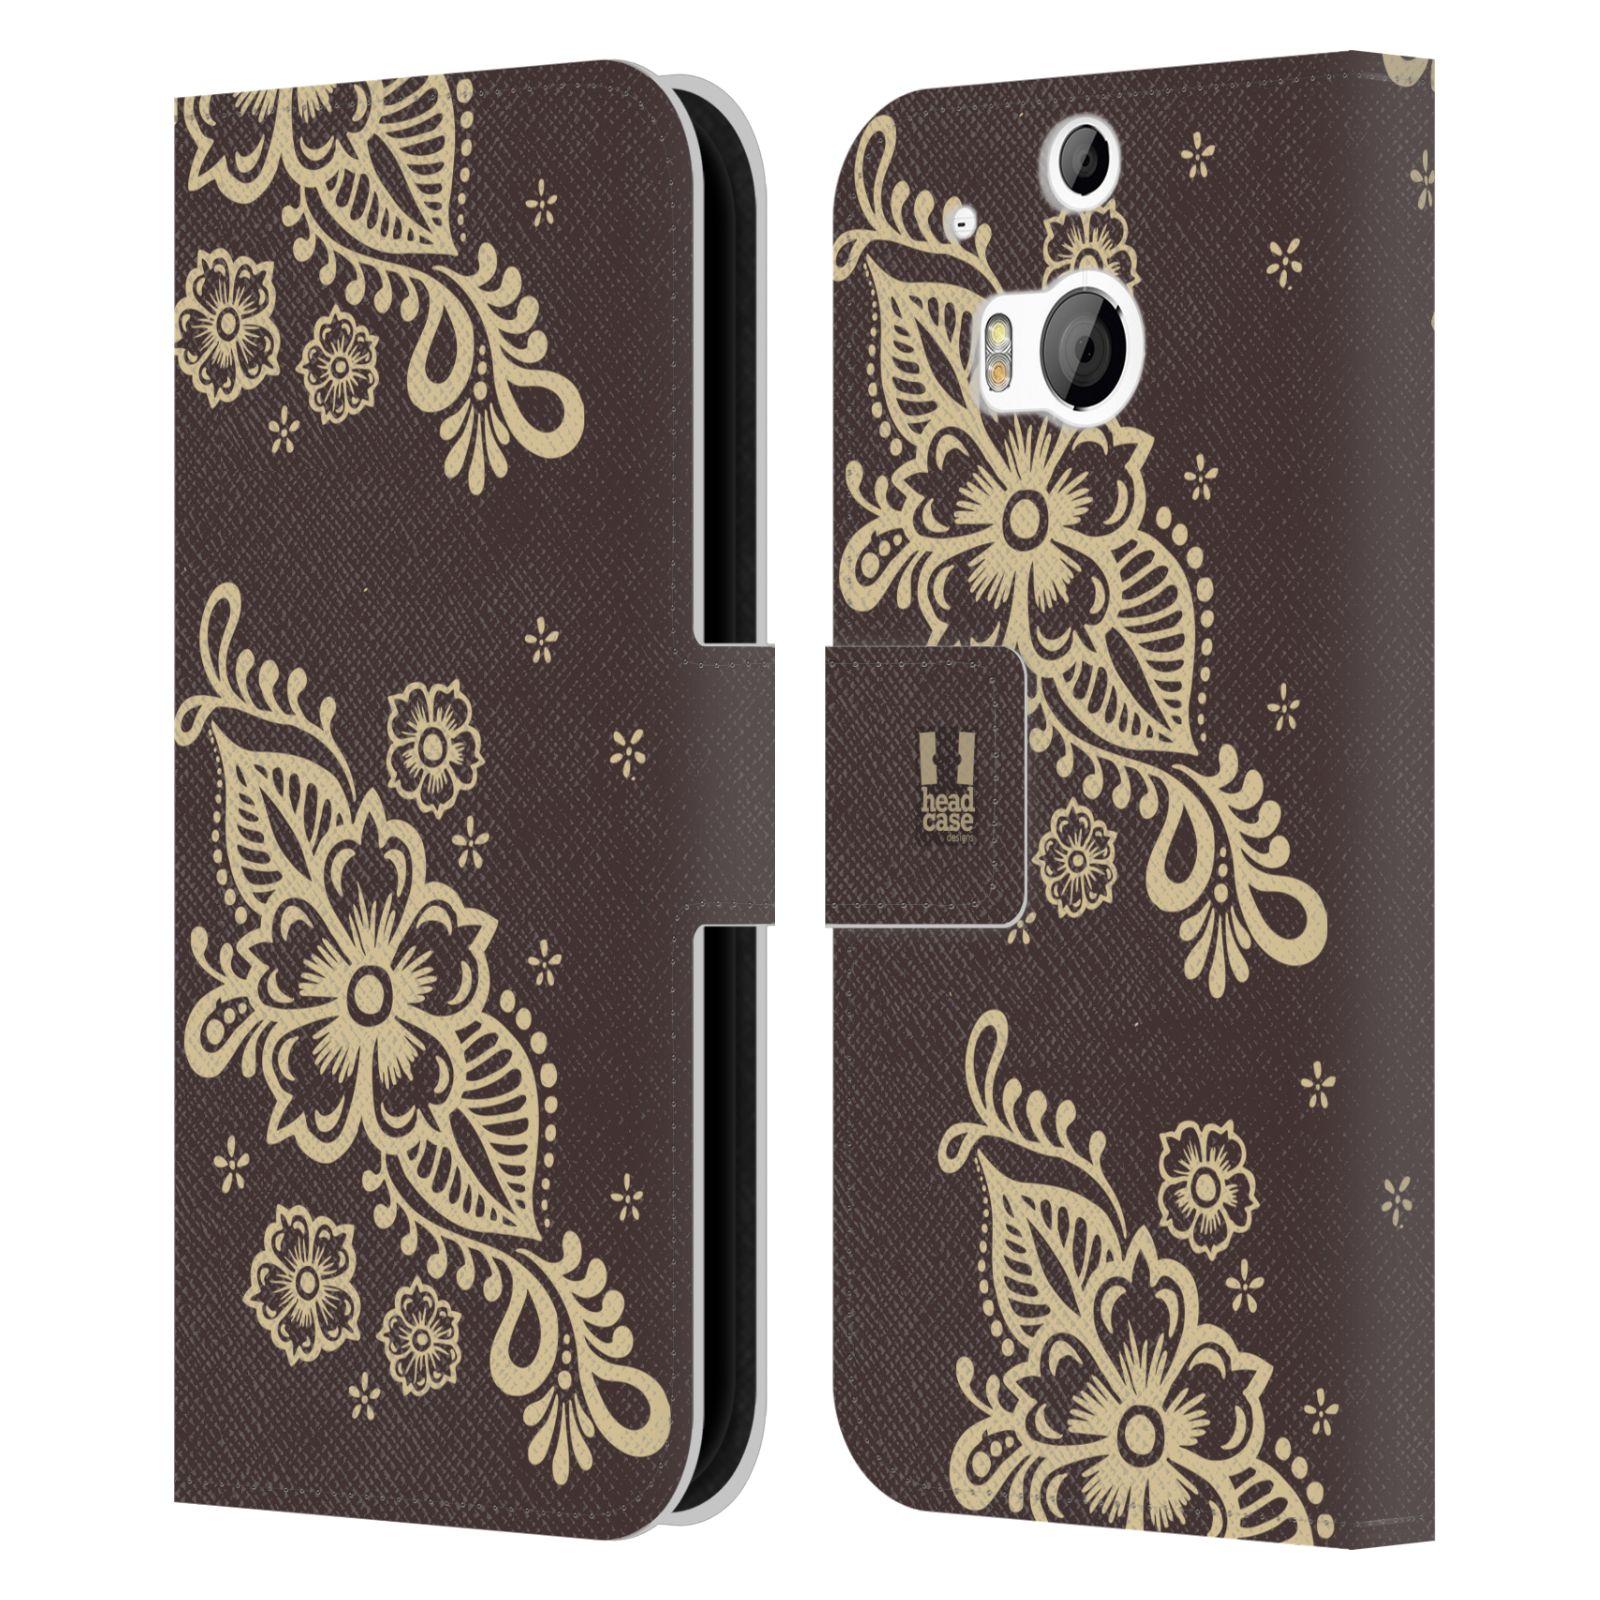 HEAD CASE Flipové pouzdro pro mobil HTC ONE (M8, M8s) Hena kresba víno